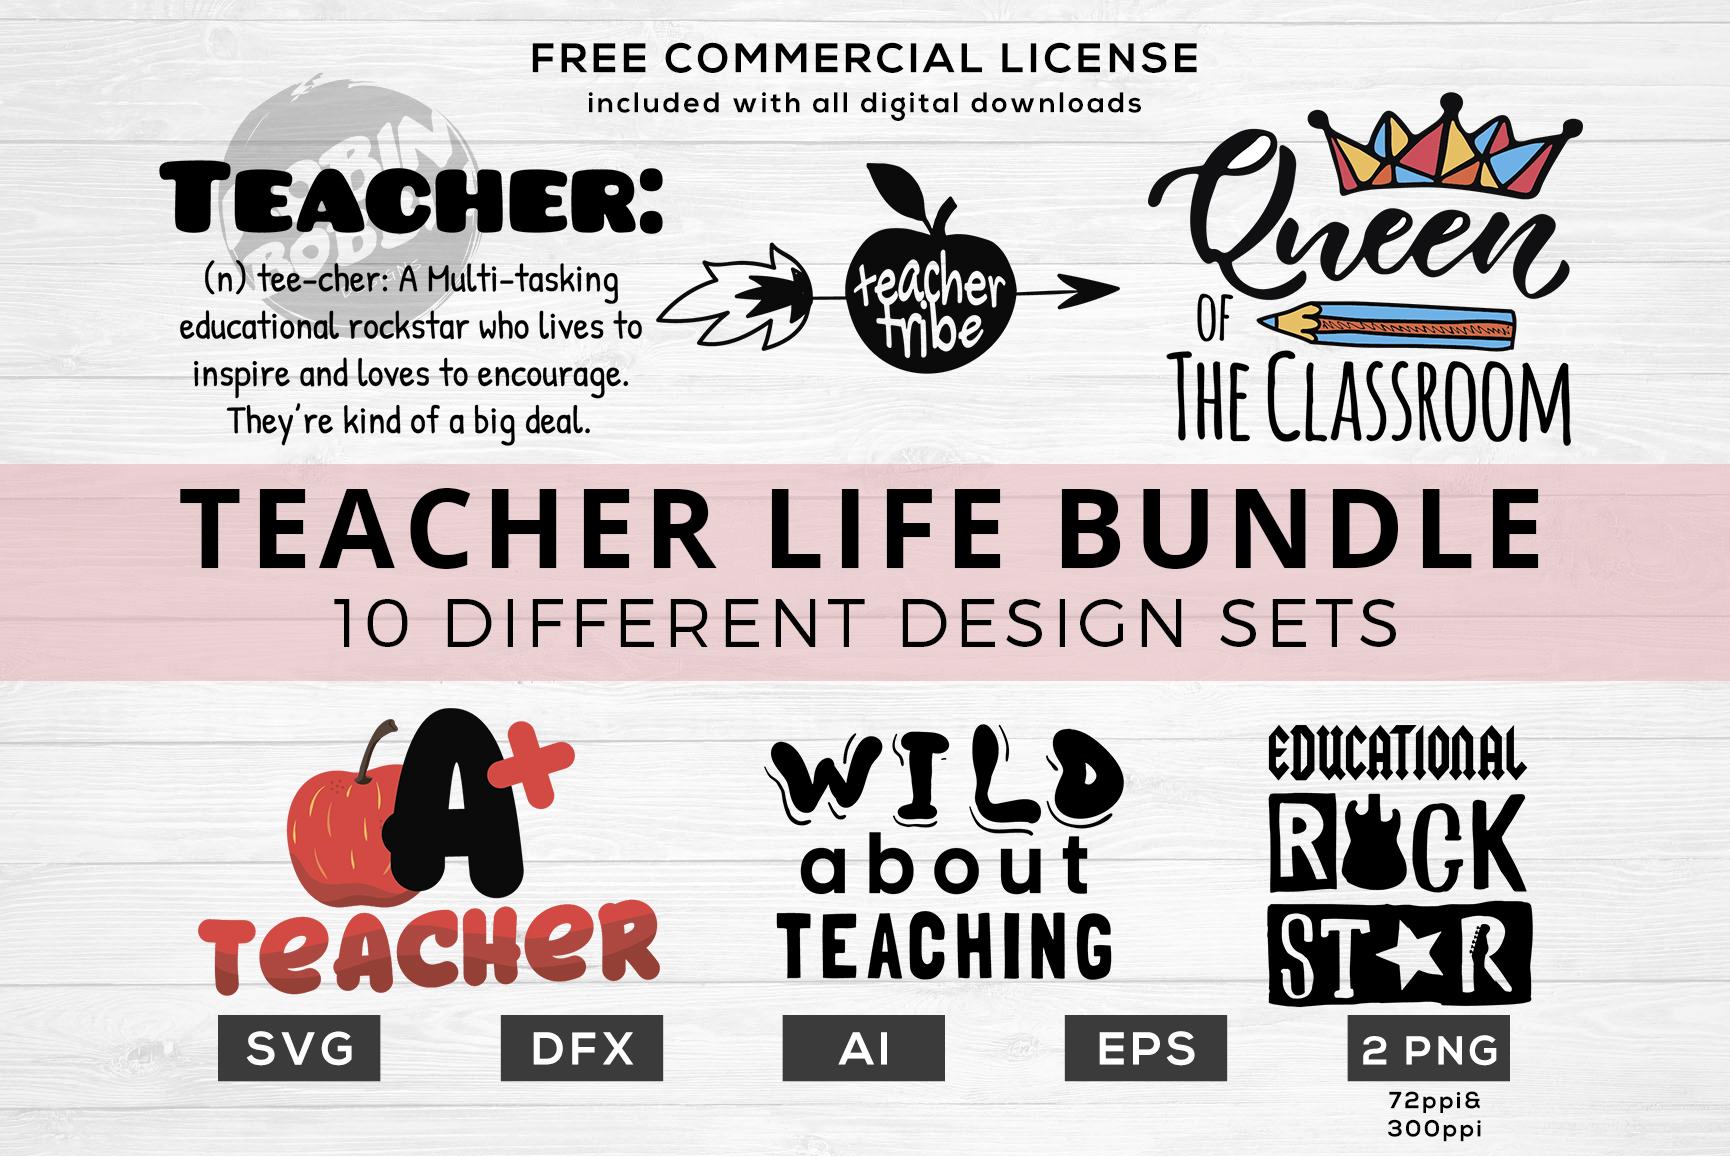 Teacher Life Bundle - Funny Teacher Quotes SVG Files example image 1